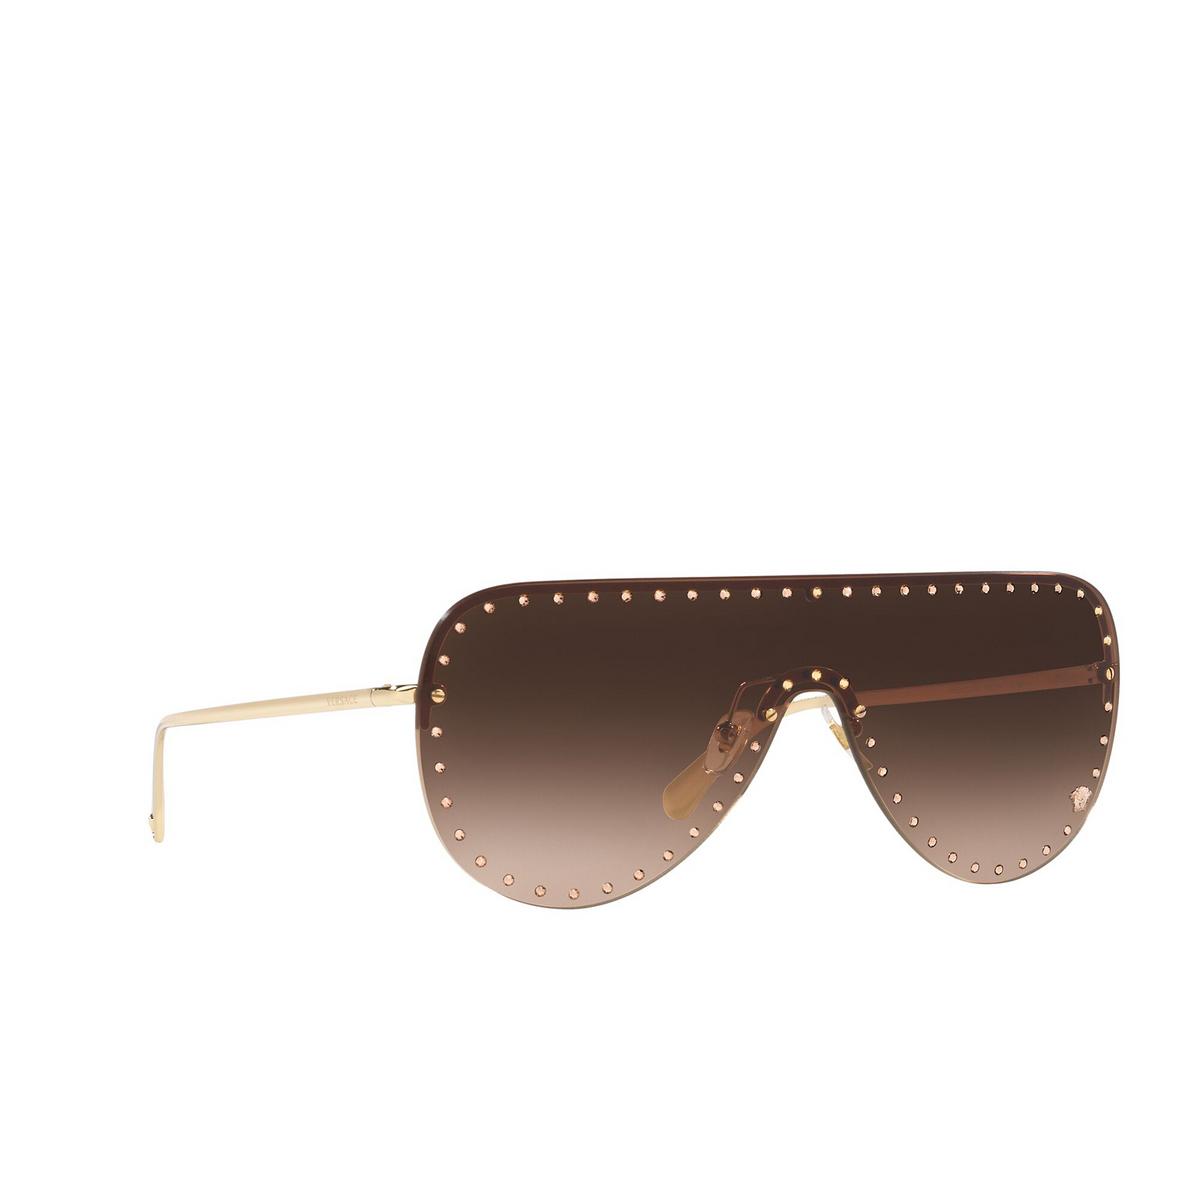 Versace® Mask Sunglasses: VE2230B color Pale Gold 125213 - three-quarters view.